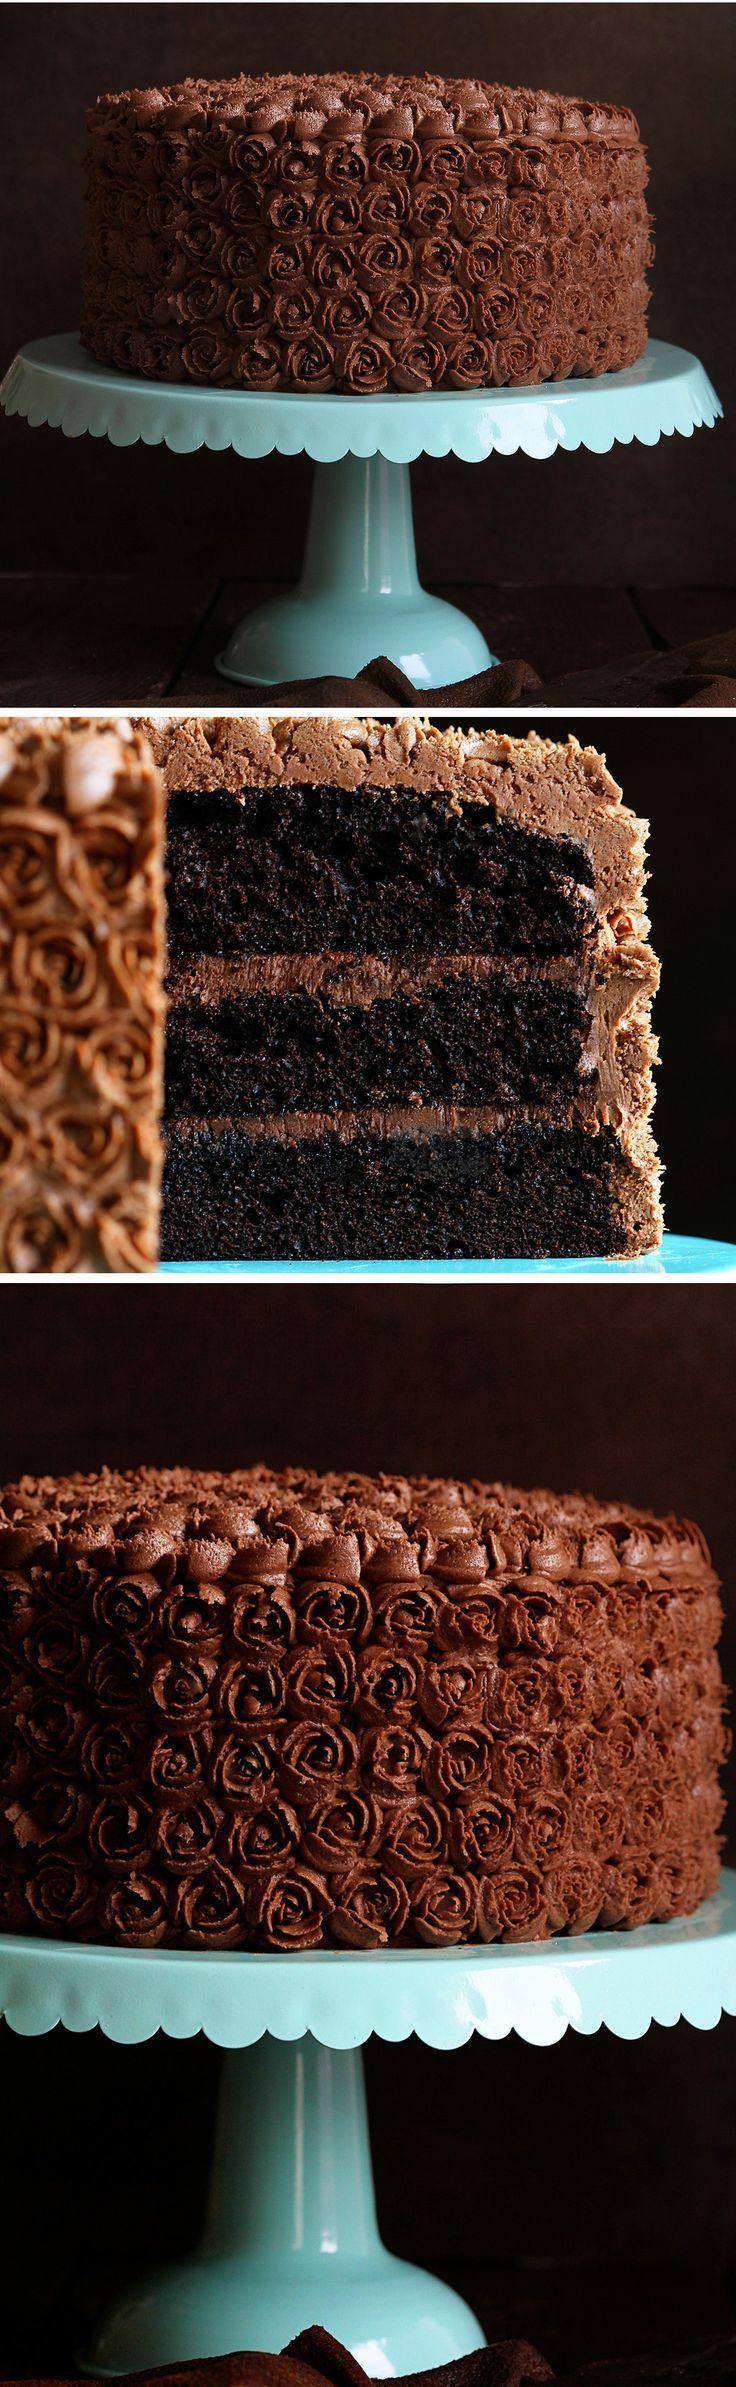 Mini Rosettes on a Chocolate Cake with Chocolate Coffee Buttercream!